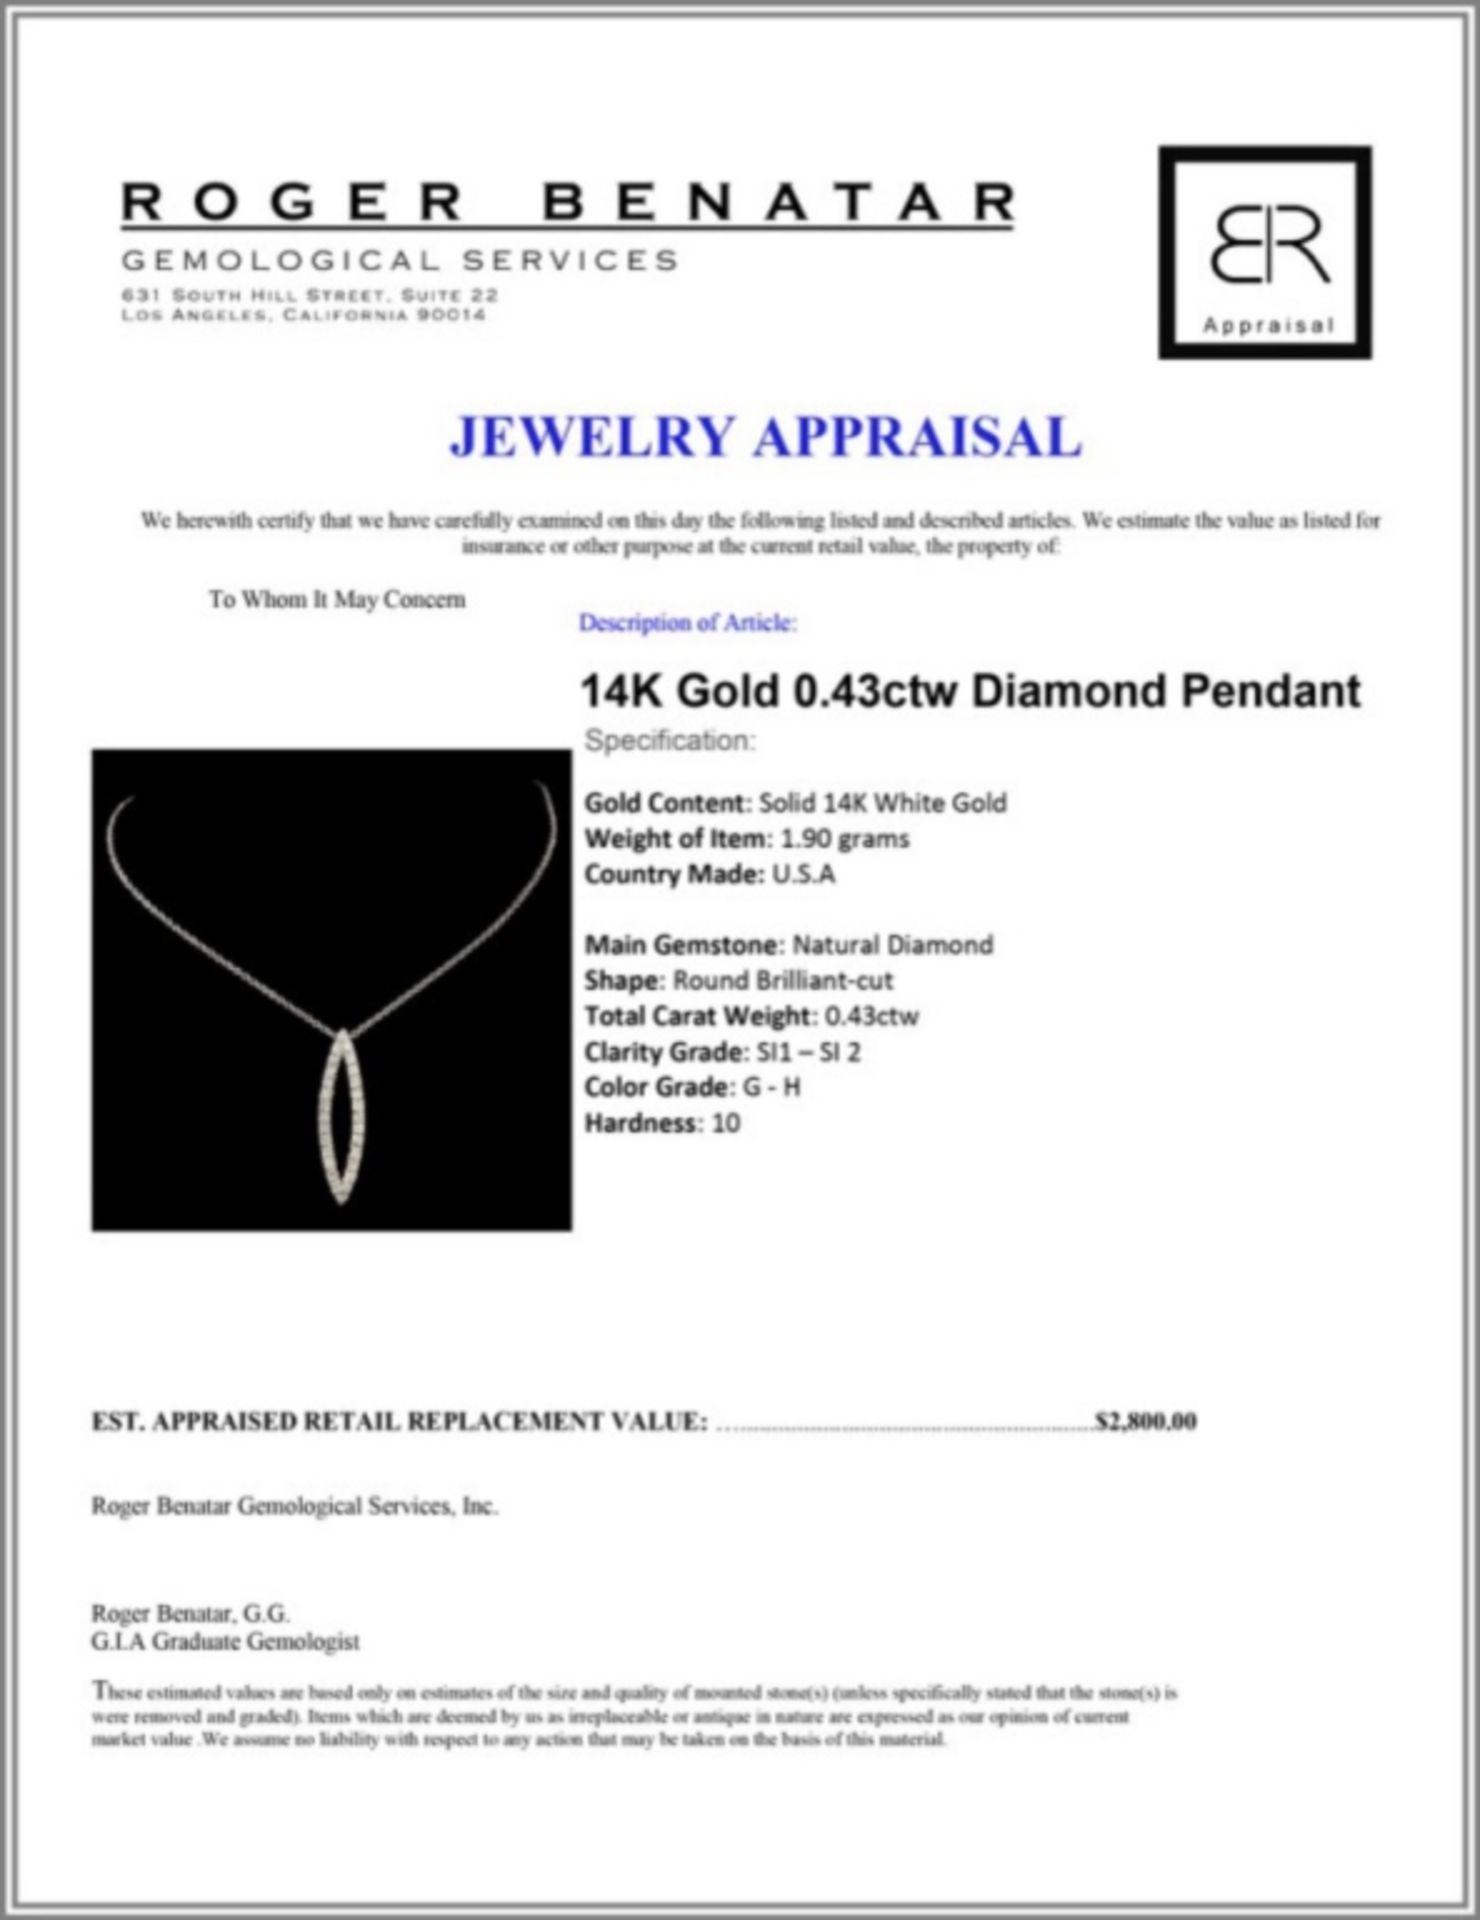 14K Gold 0.43ctw Diamond Pendant - Image 3 of 3